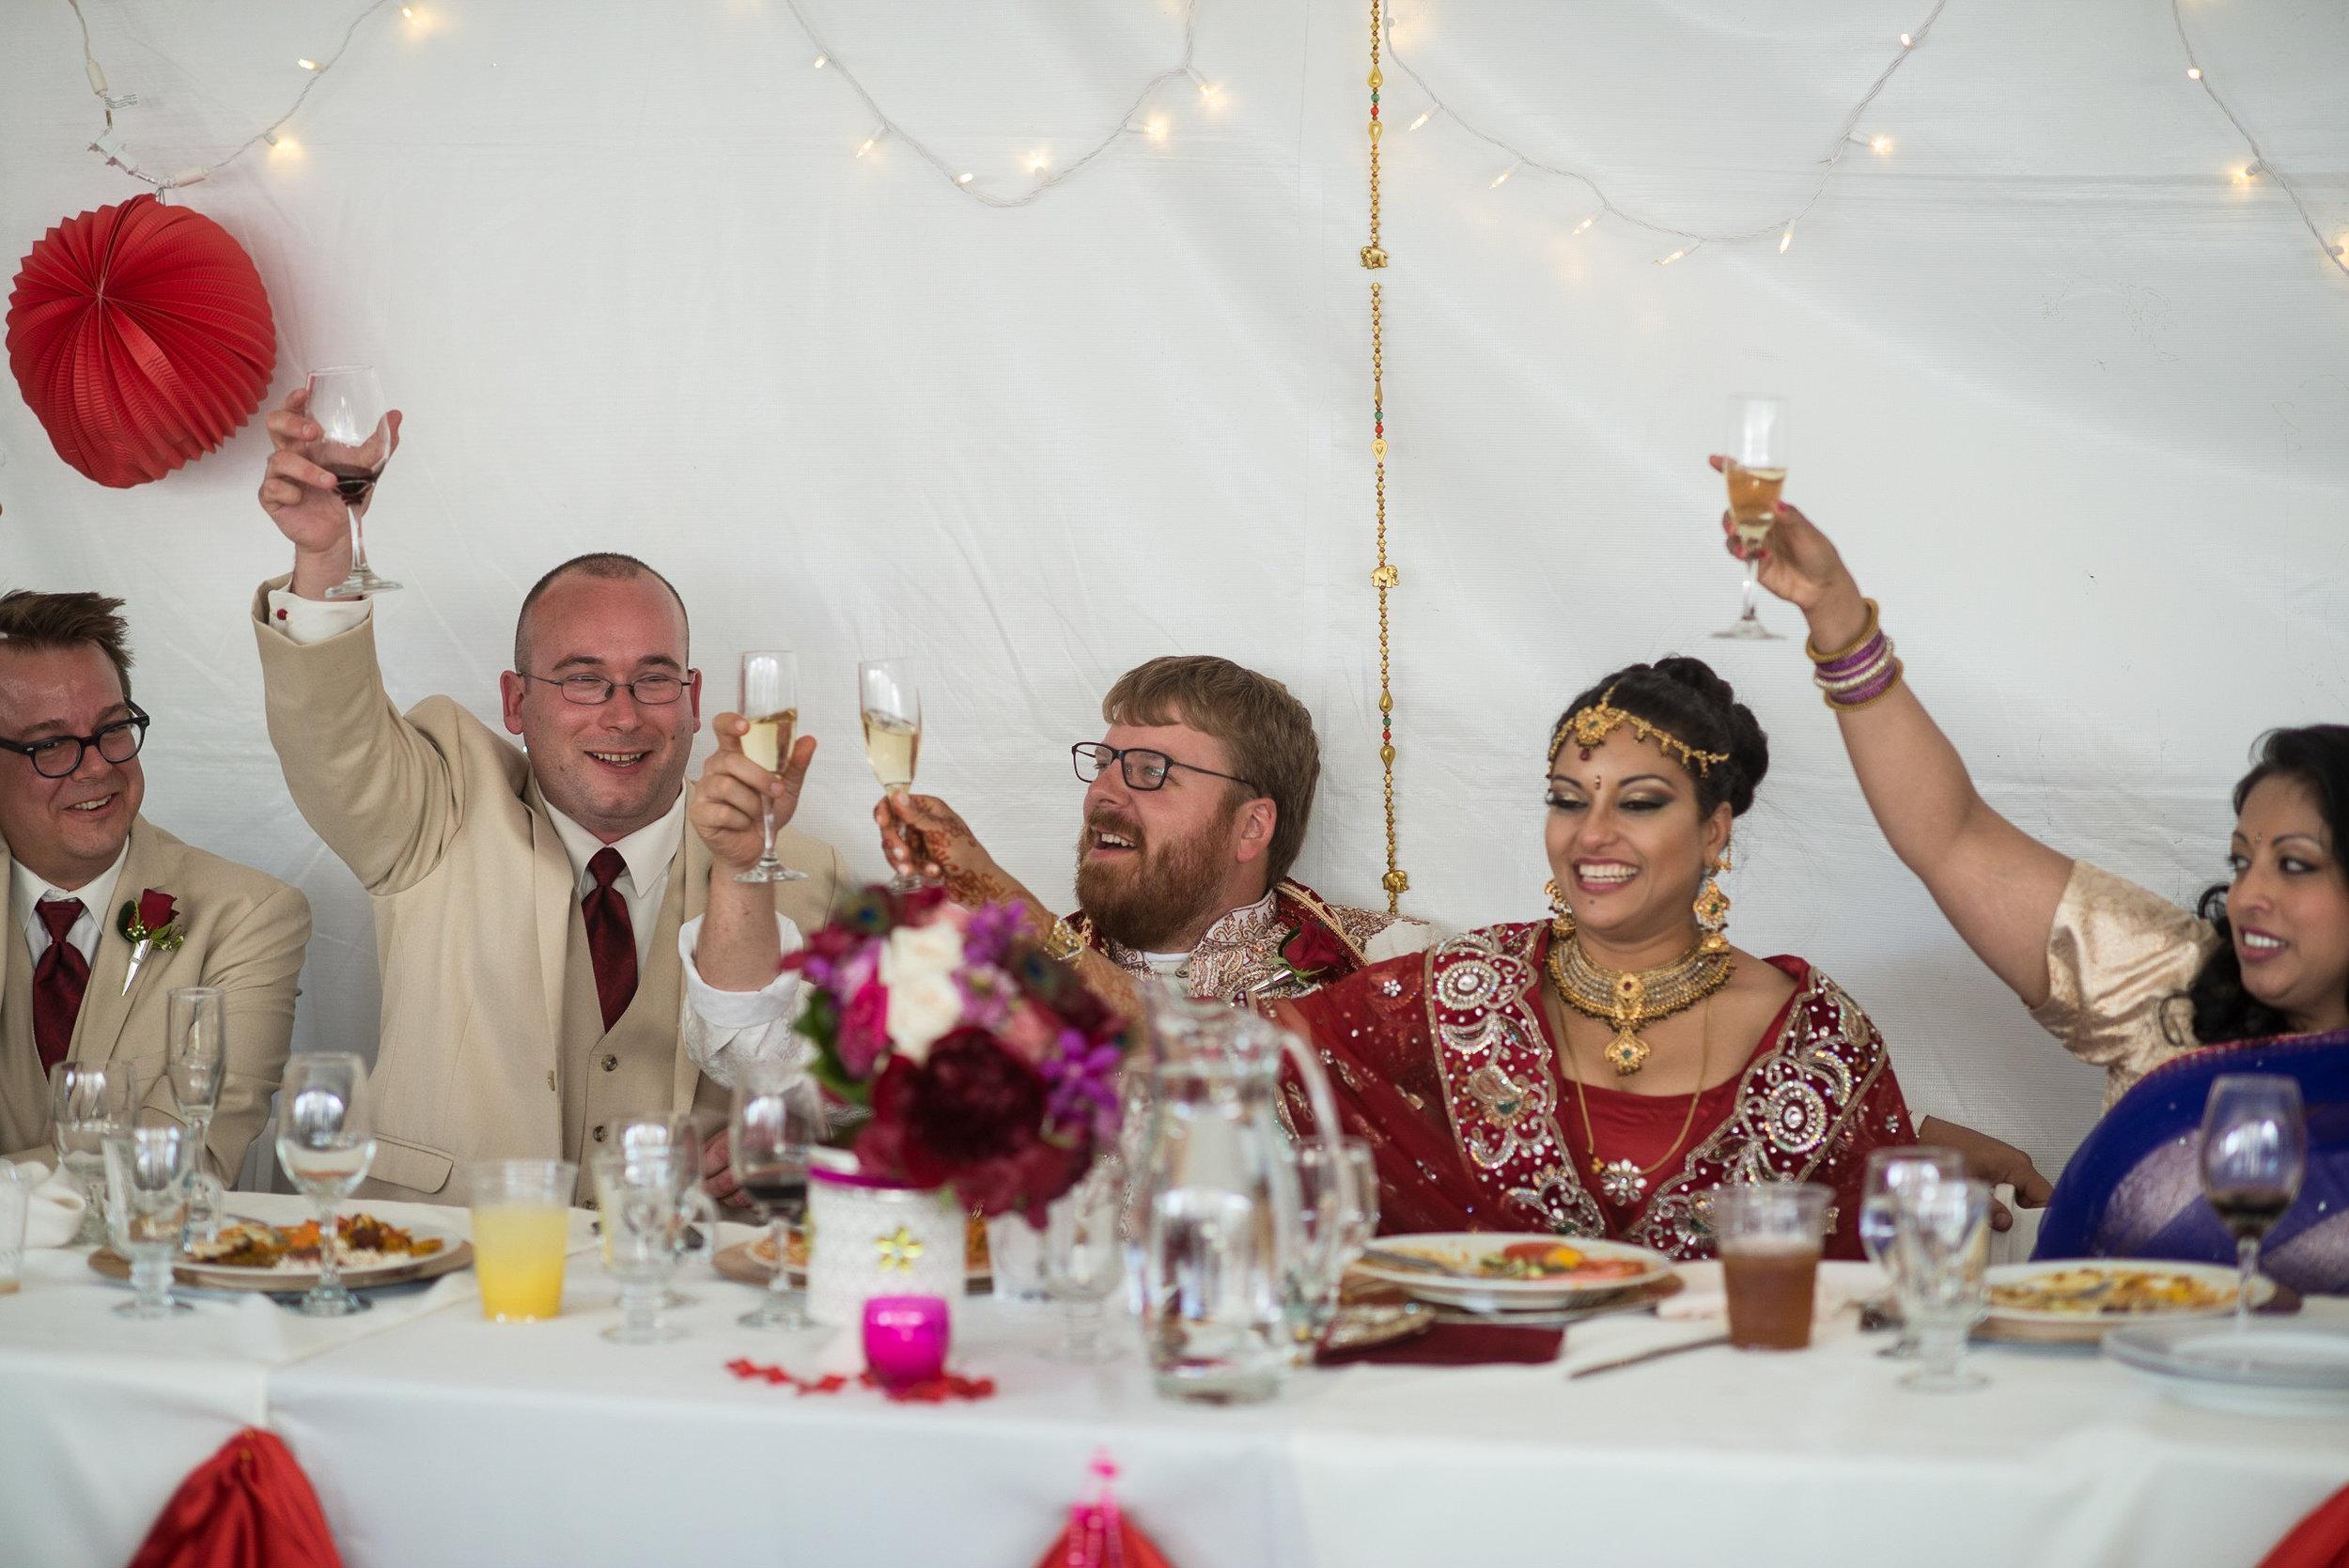 20150509-Meg-and-Thomas-Wedding-1021-DSC_0912.jpg